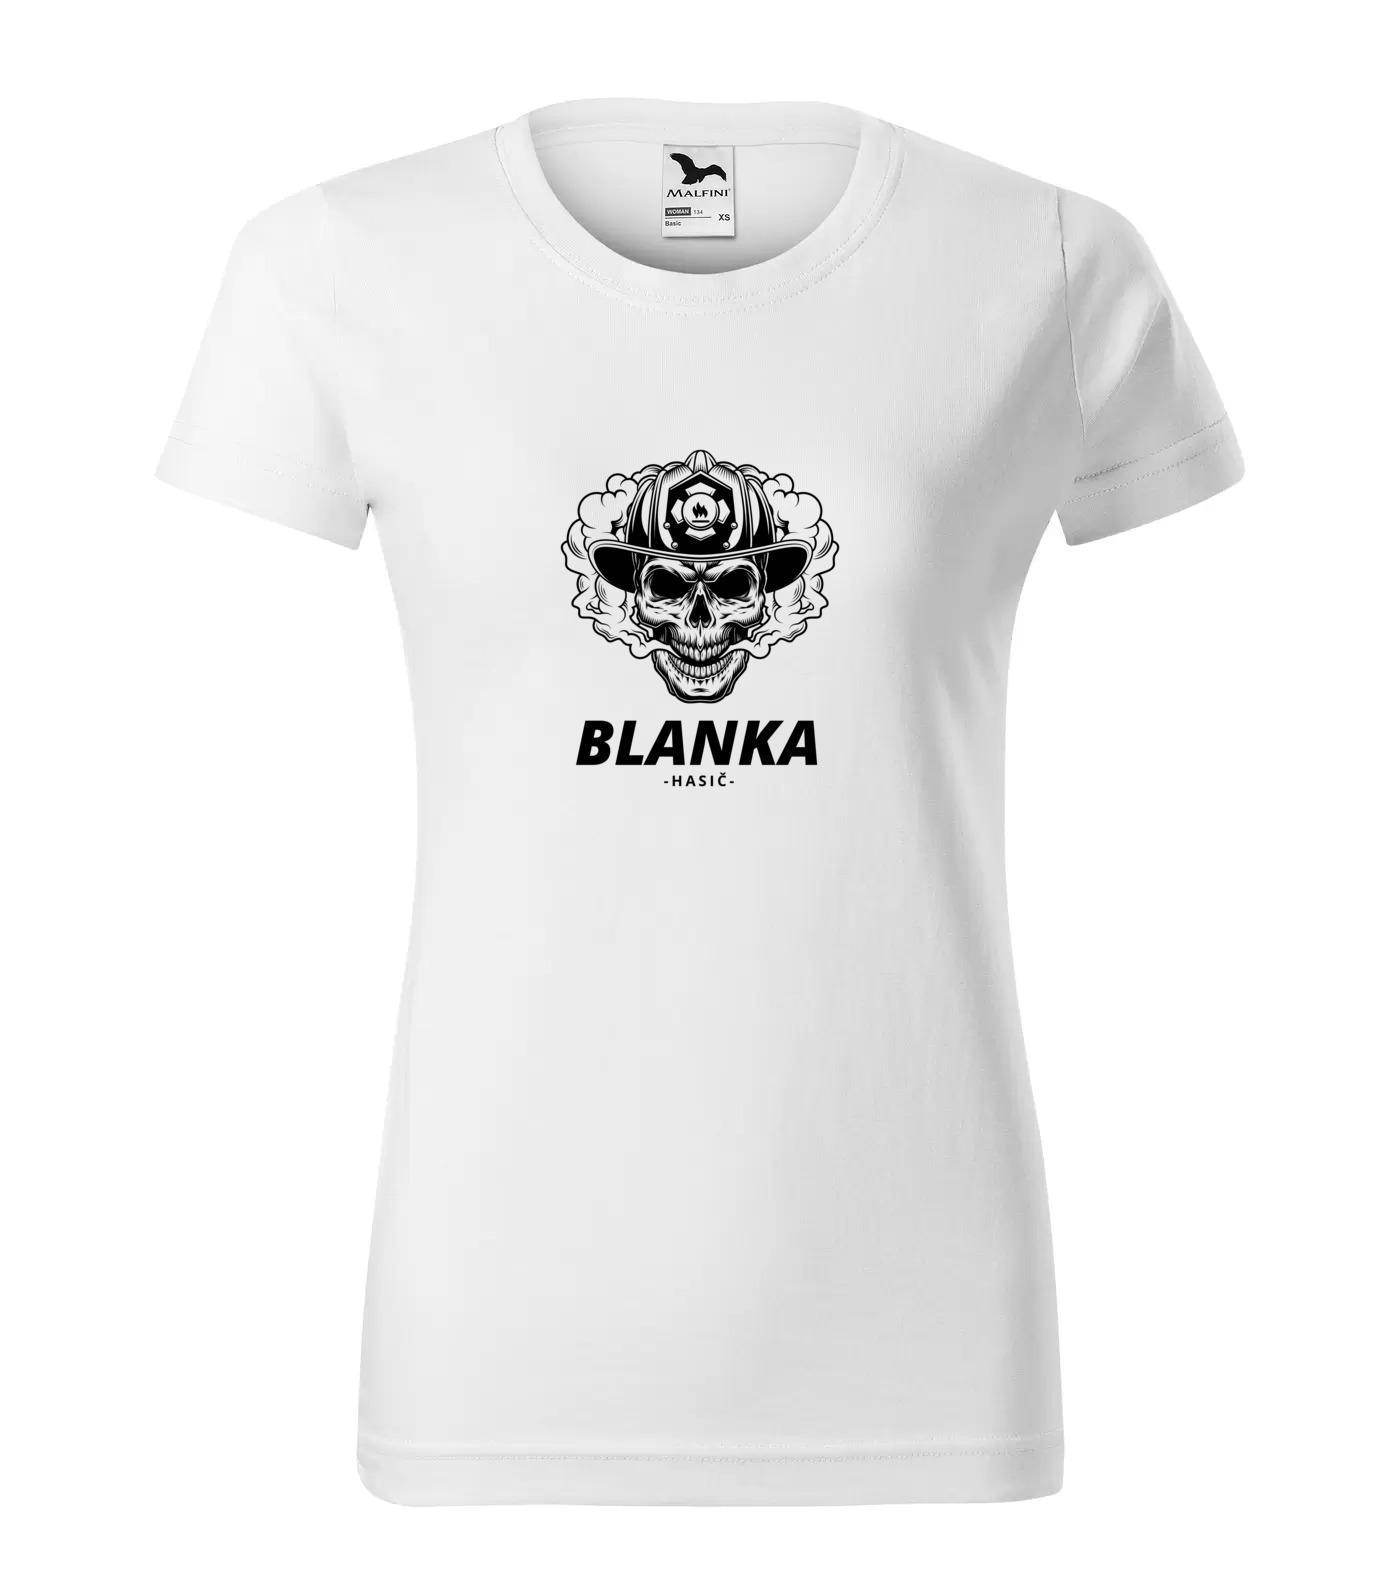 Tričko Hasič Blanka